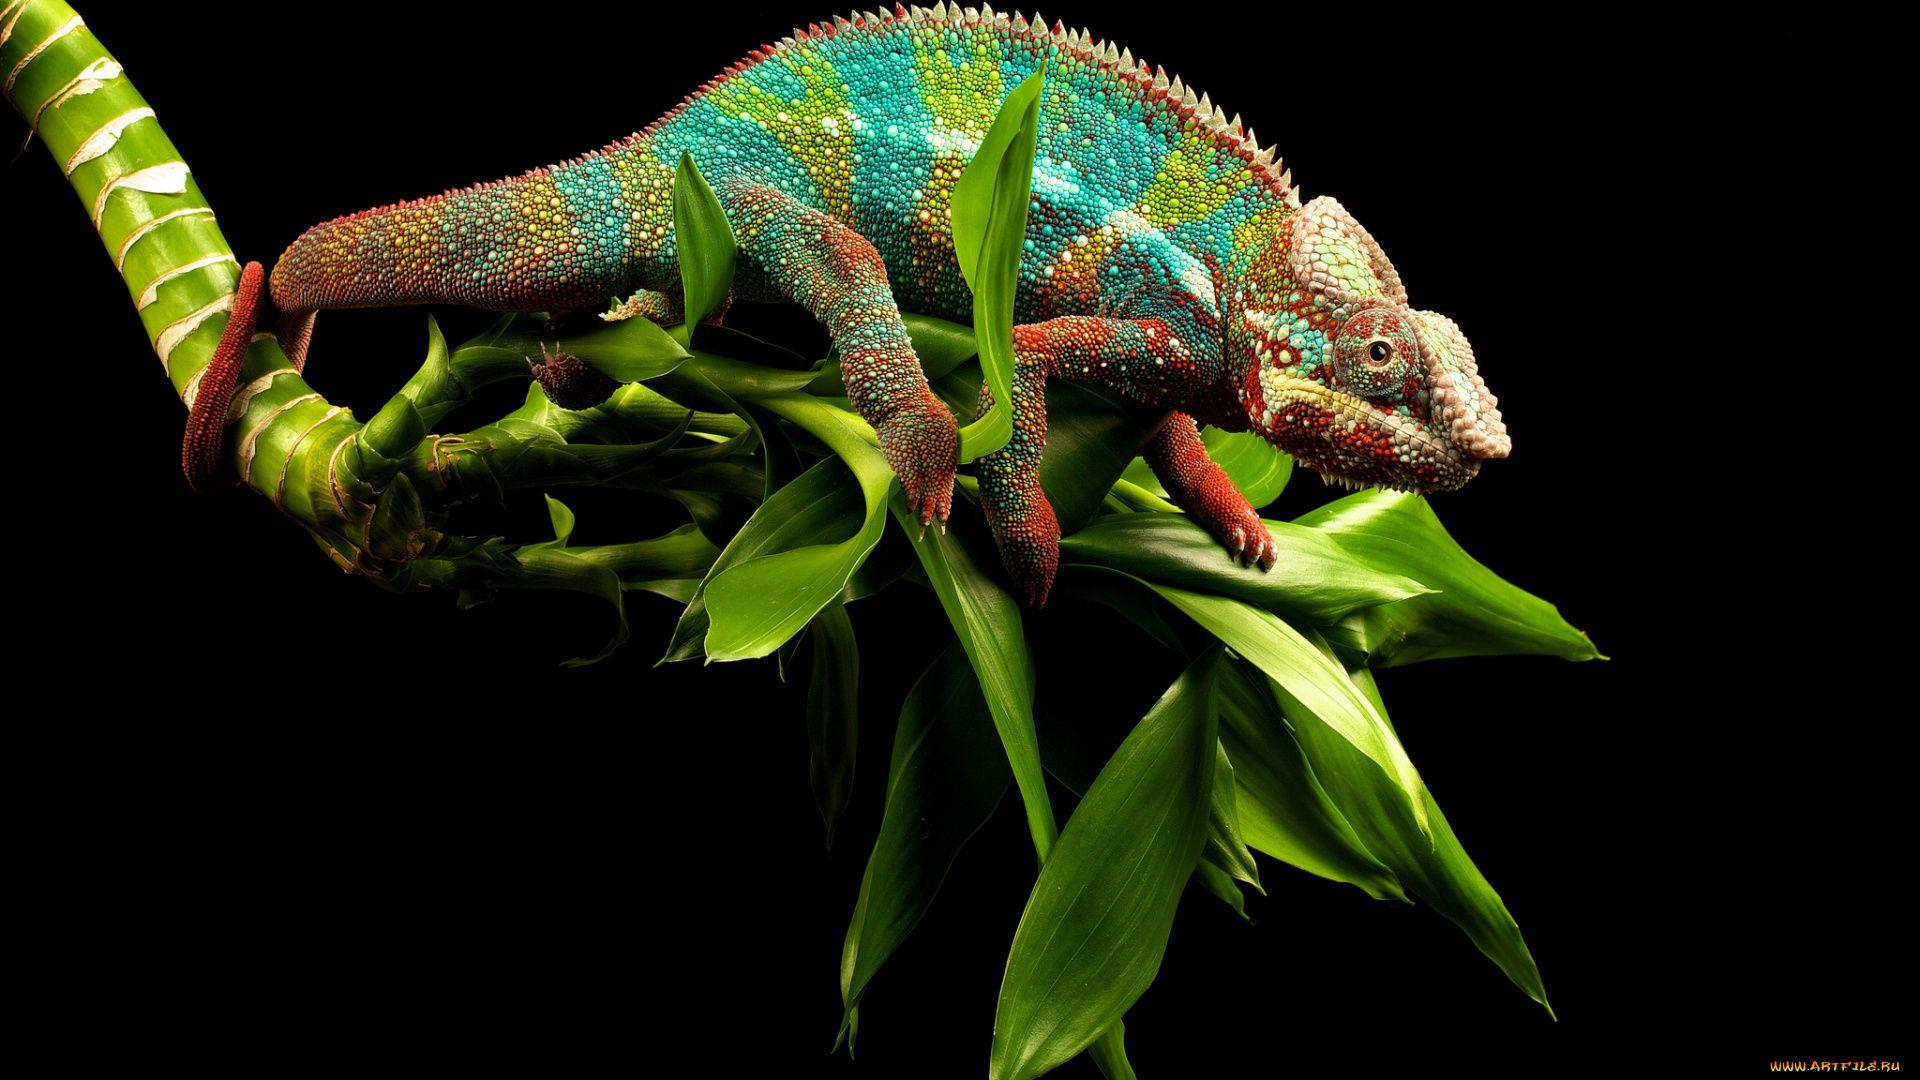 Chameleon On A Black Background